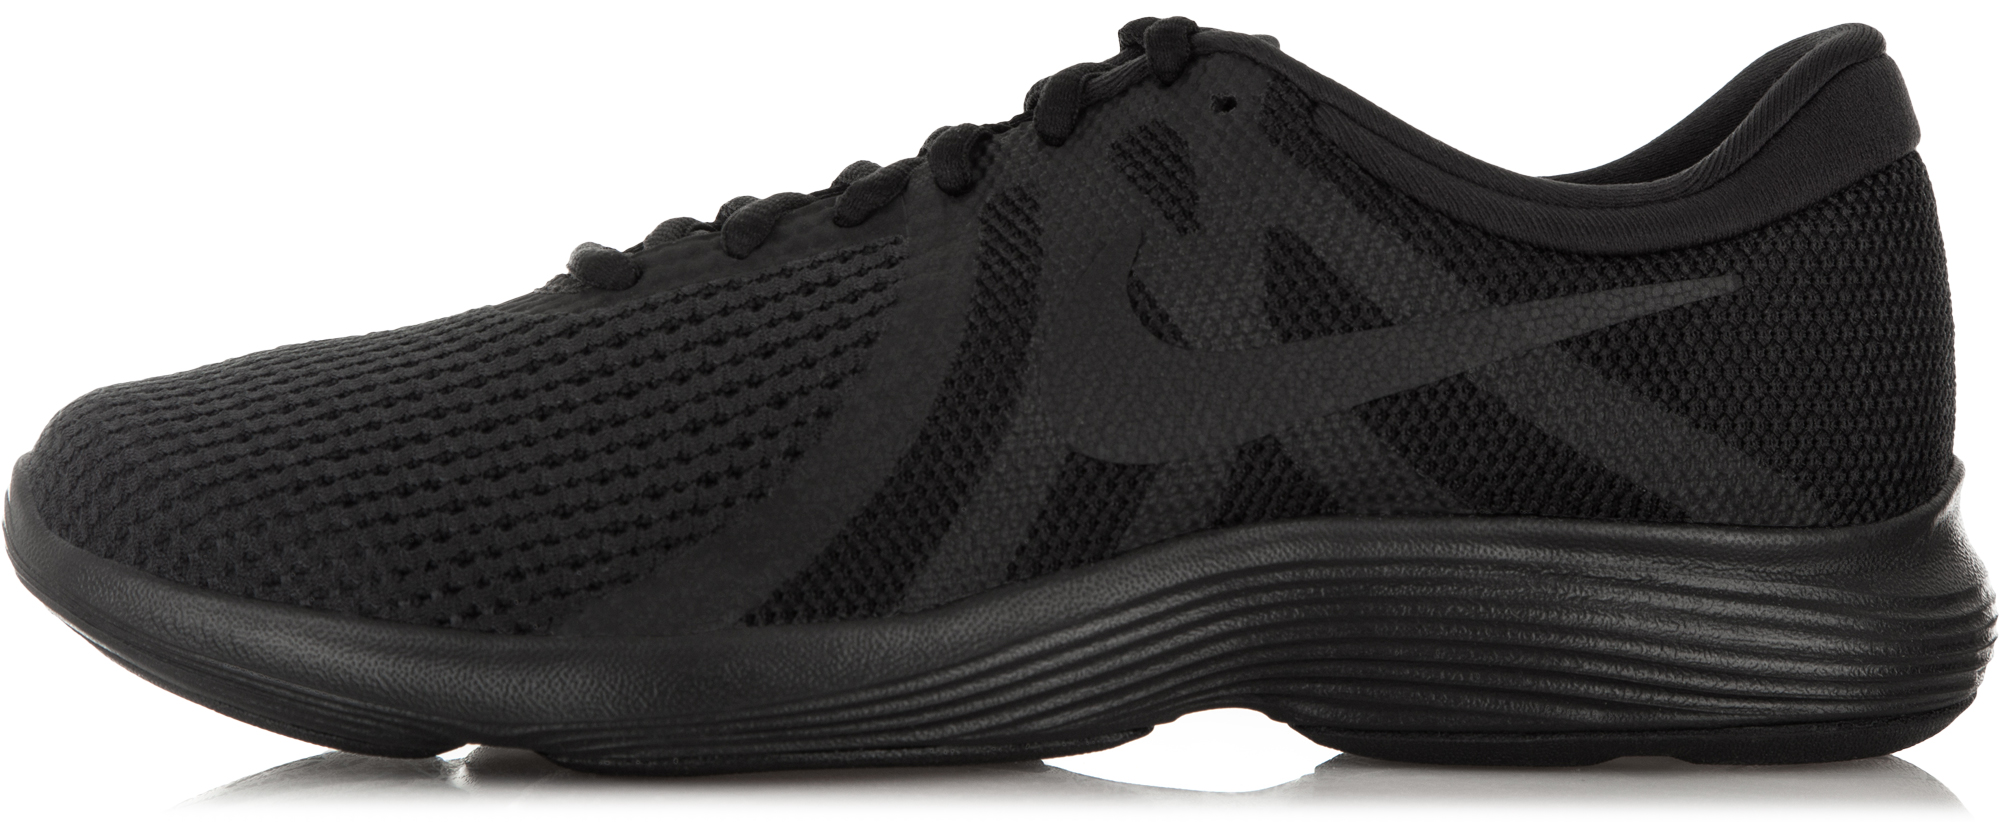 Nike Кроссовки мужские Nike Revolution 4